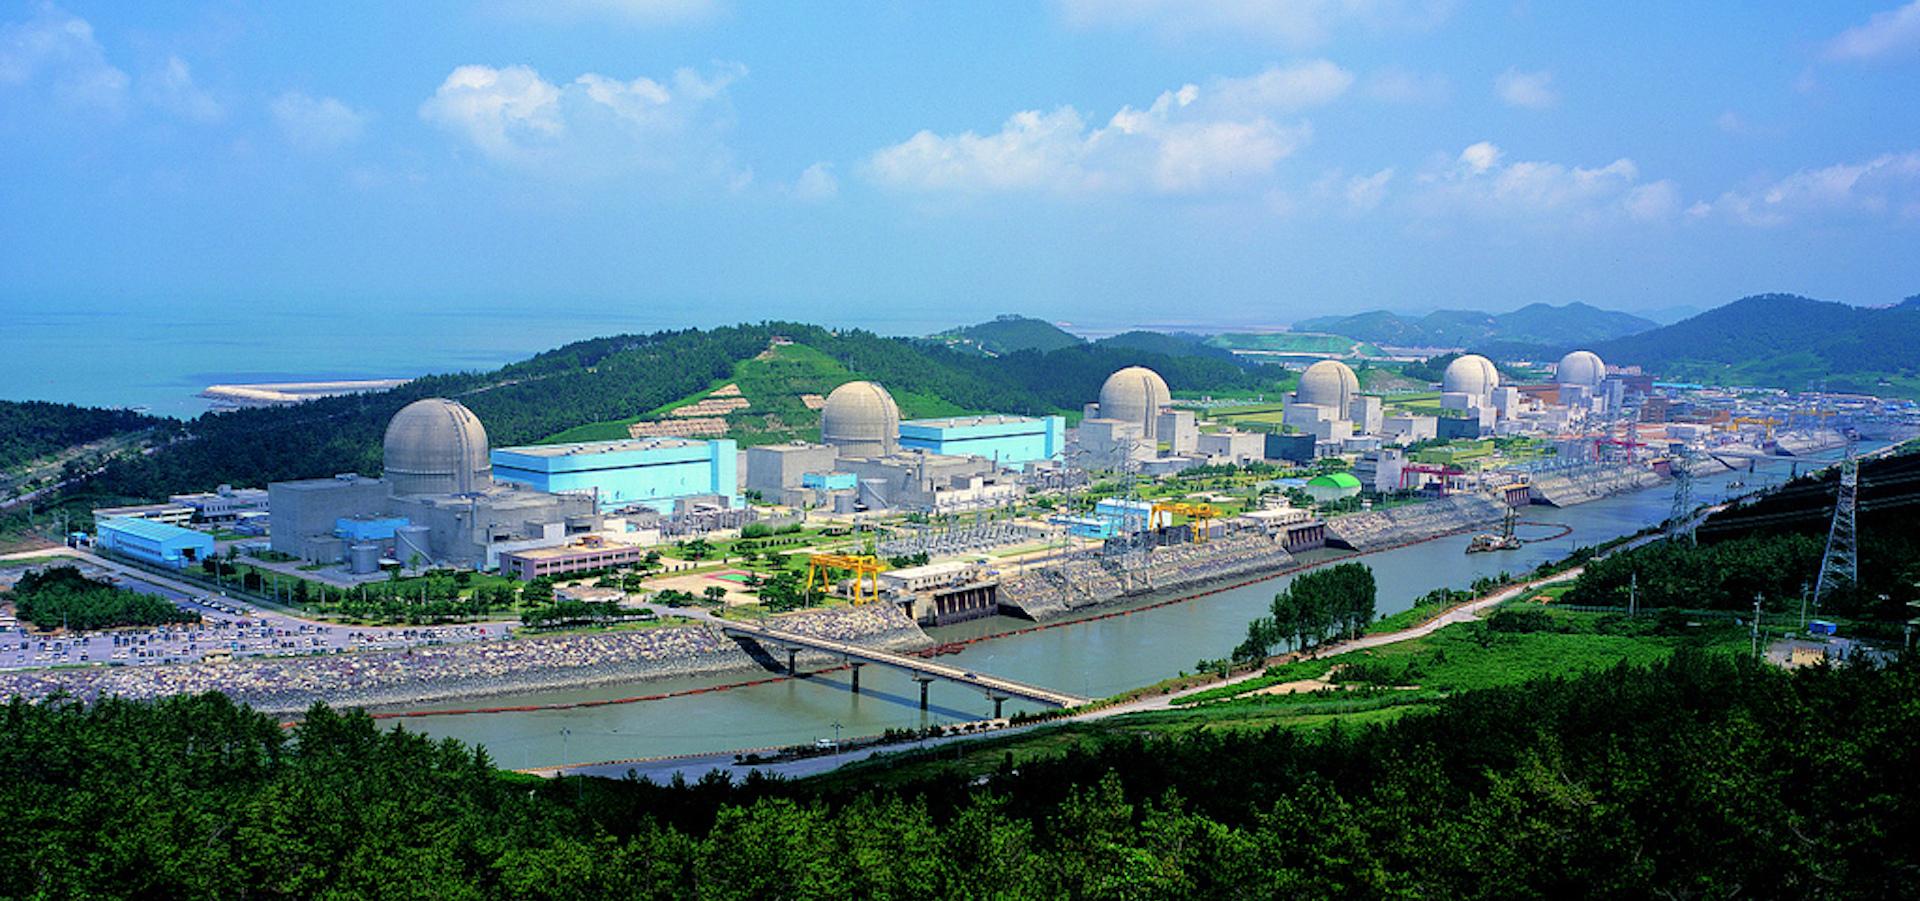 South Korea's move towards renewables | Energy Transition